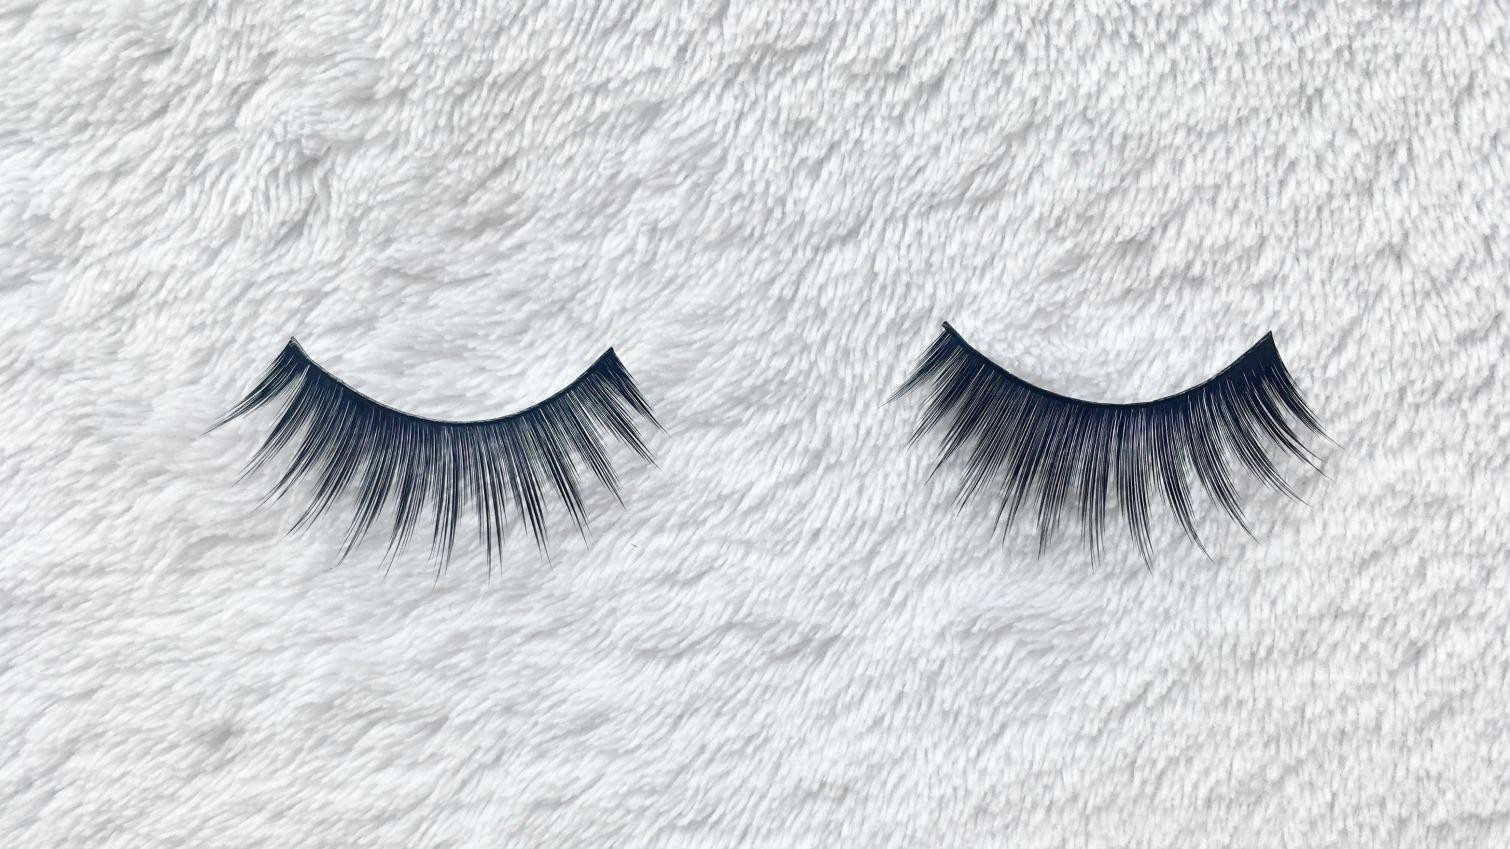 800+ Gambar Bentuk Mata  Gratis